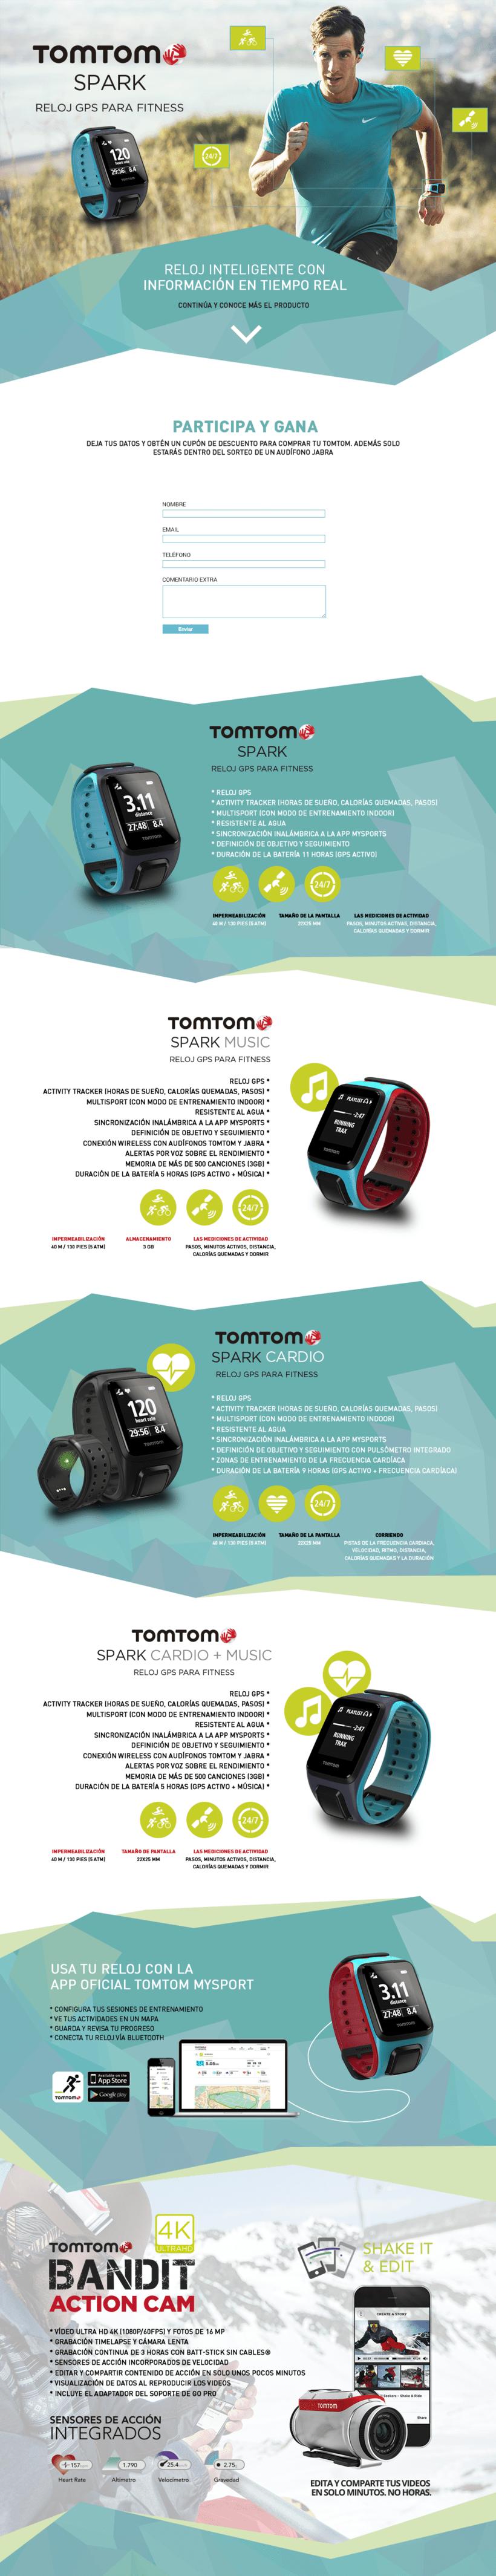 Campaña Digital Tom Tom  1